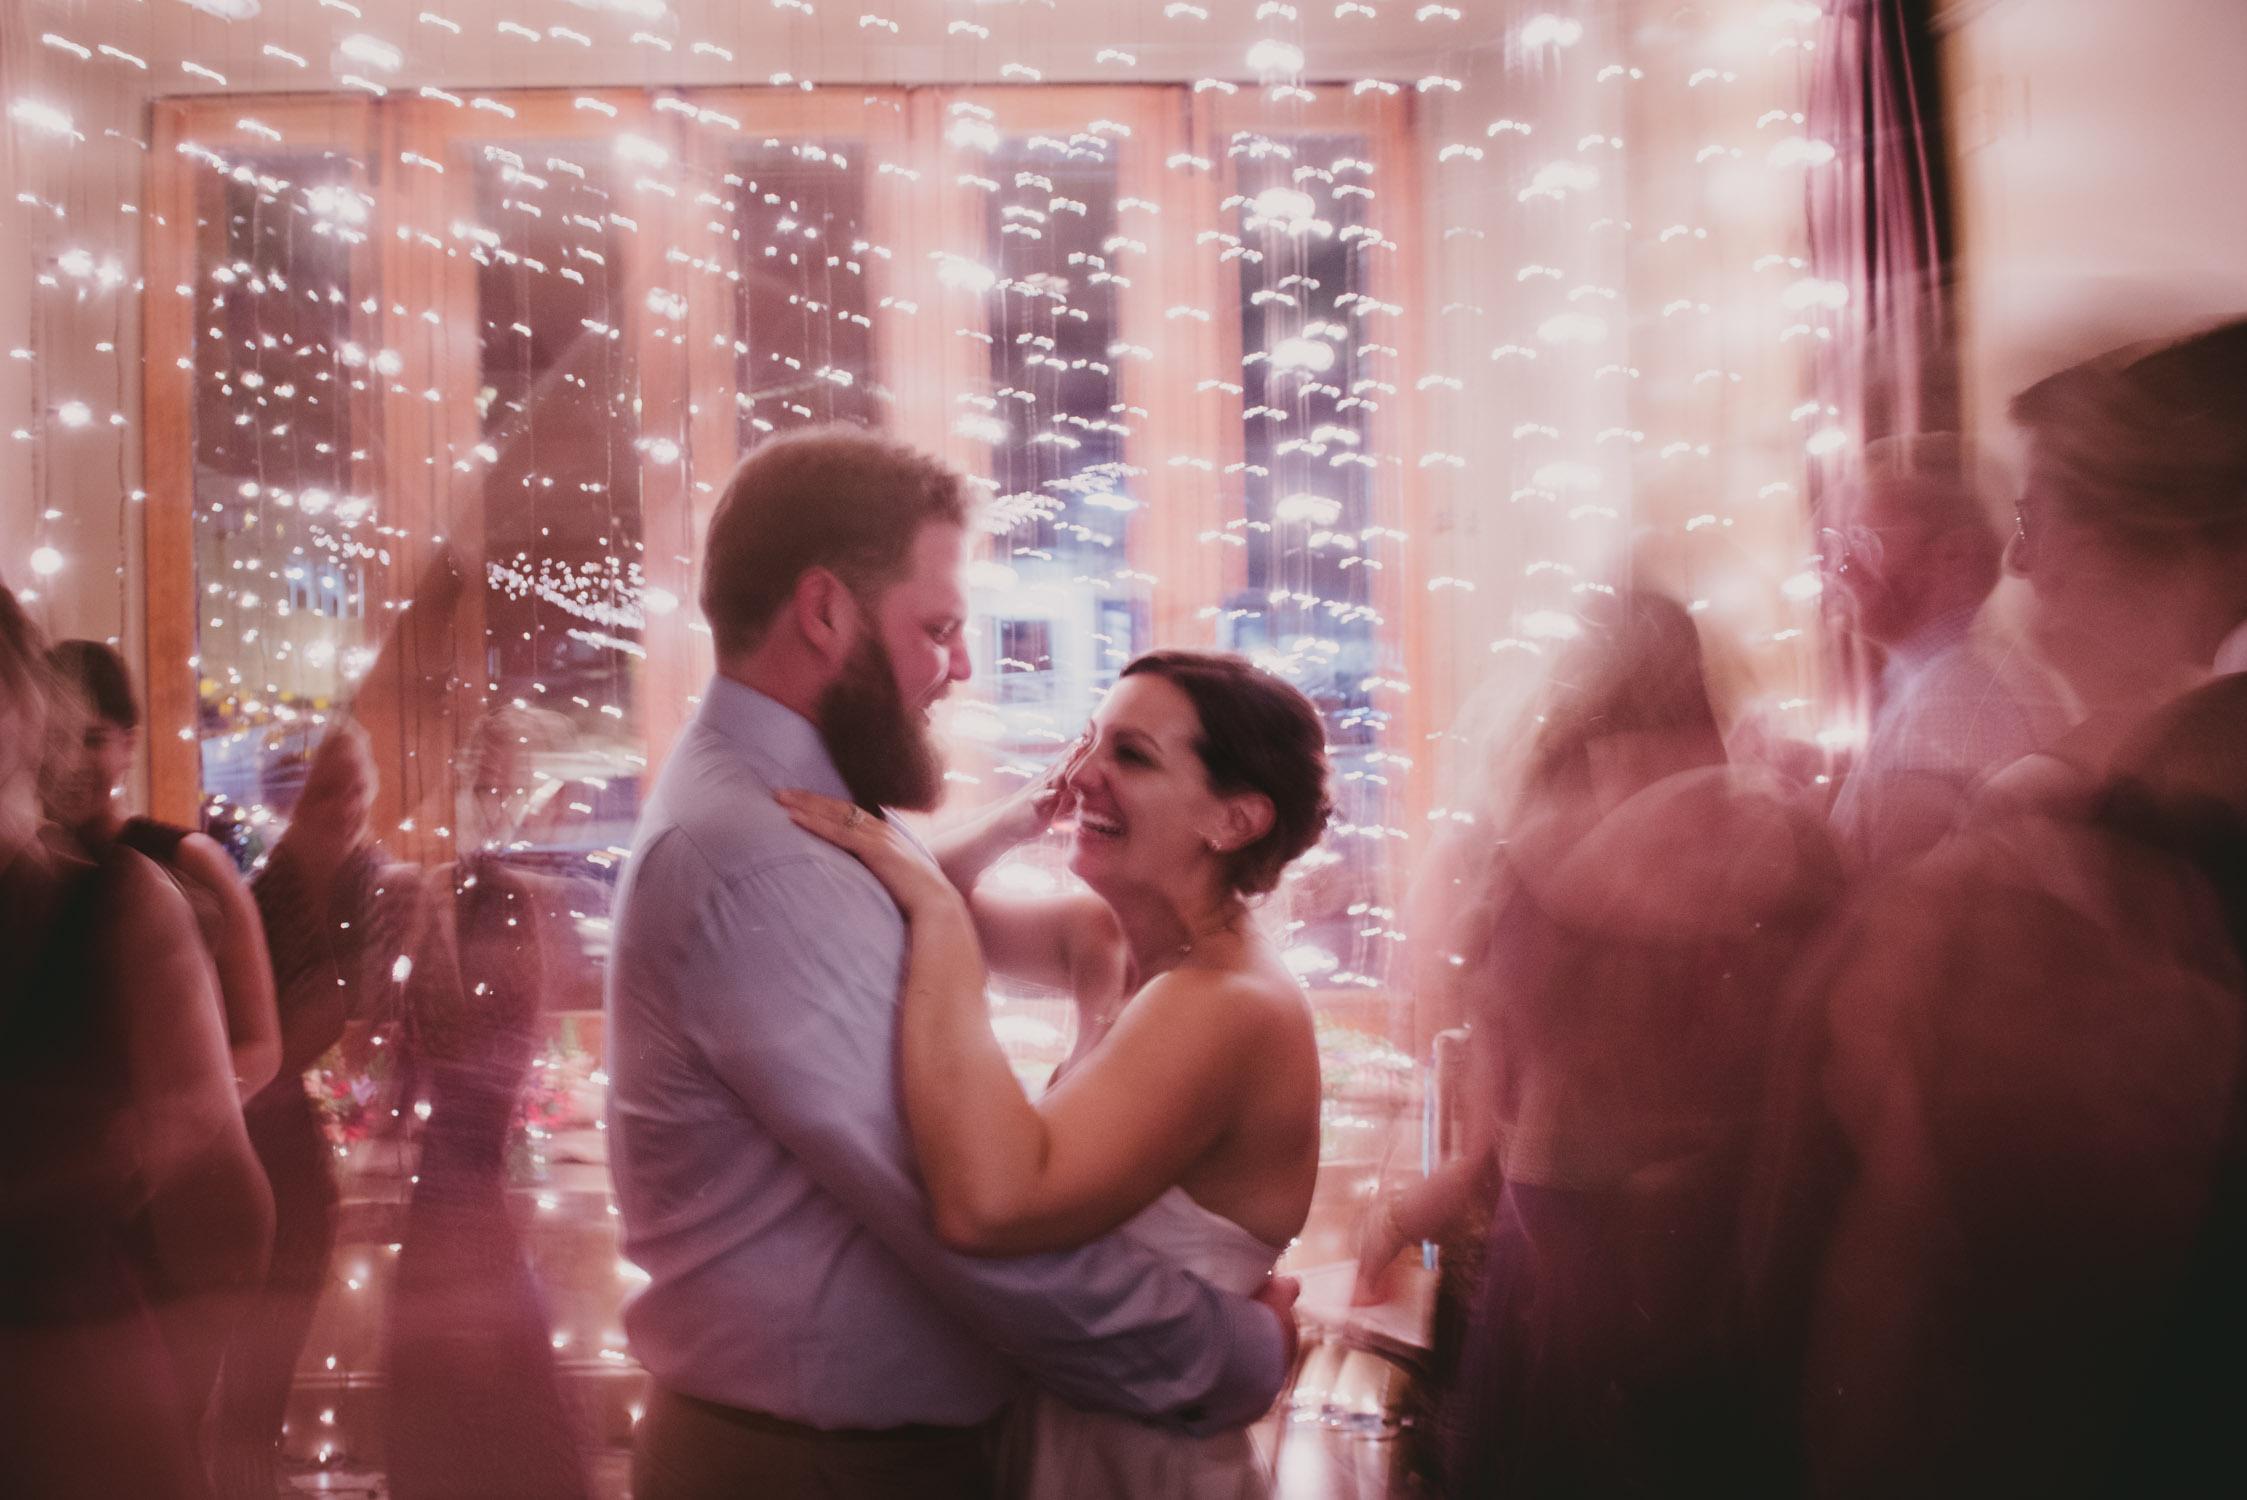 Crunkleton Wedding reception photo